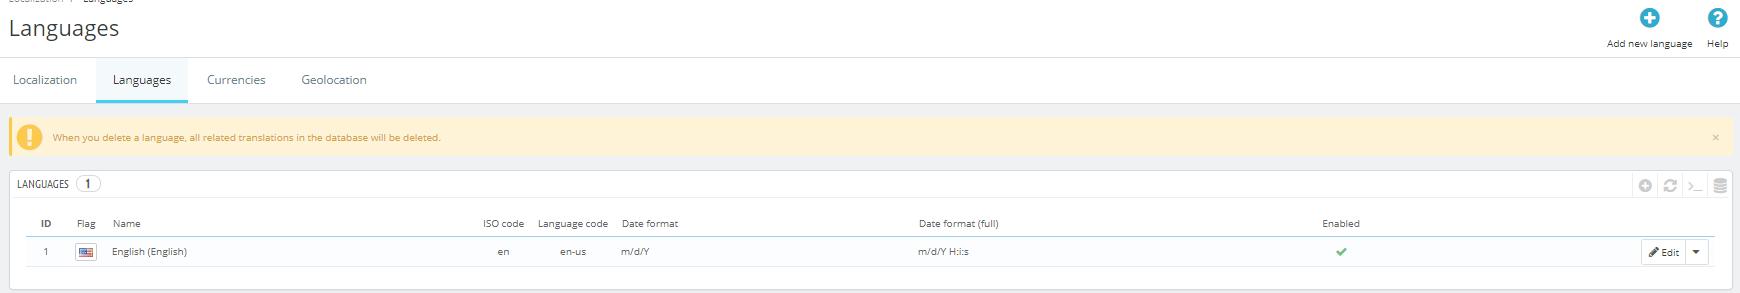 languages prestashop 1.7.5.0